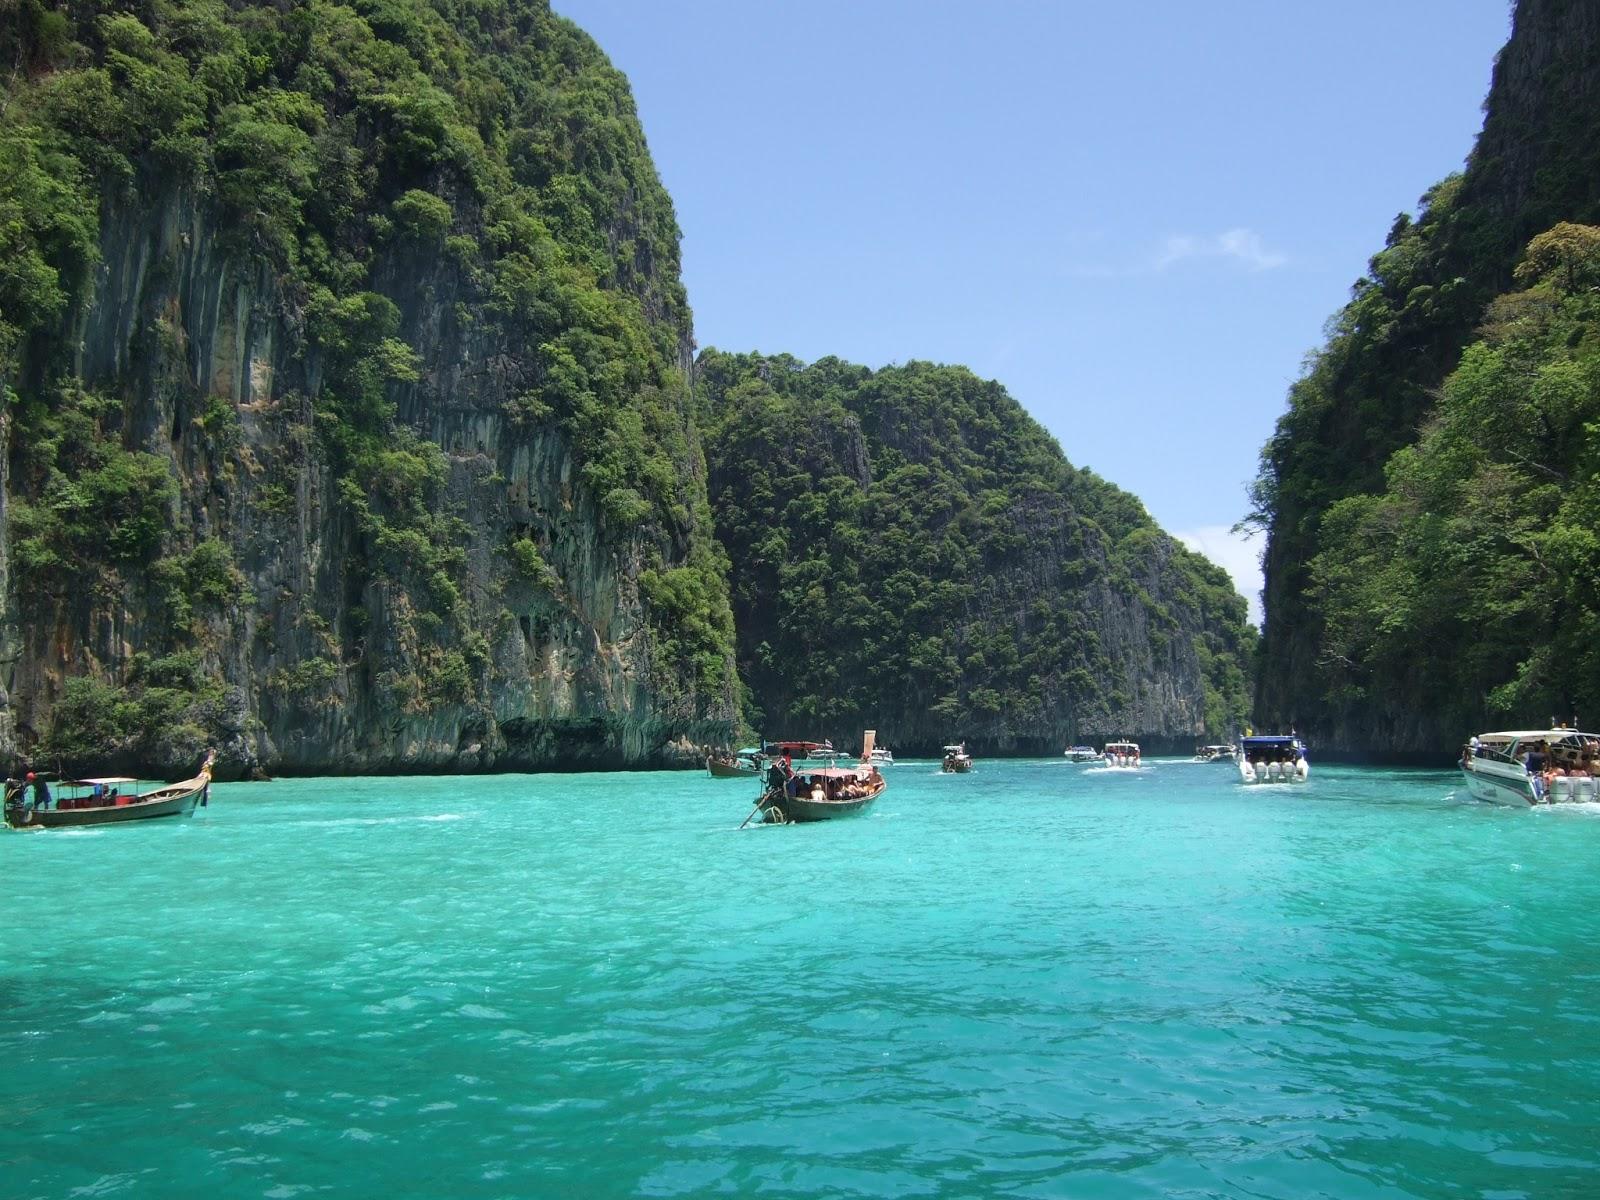 phuket thailand james bond island. Black Bedroom Furniture Sets. Home Design Ideas